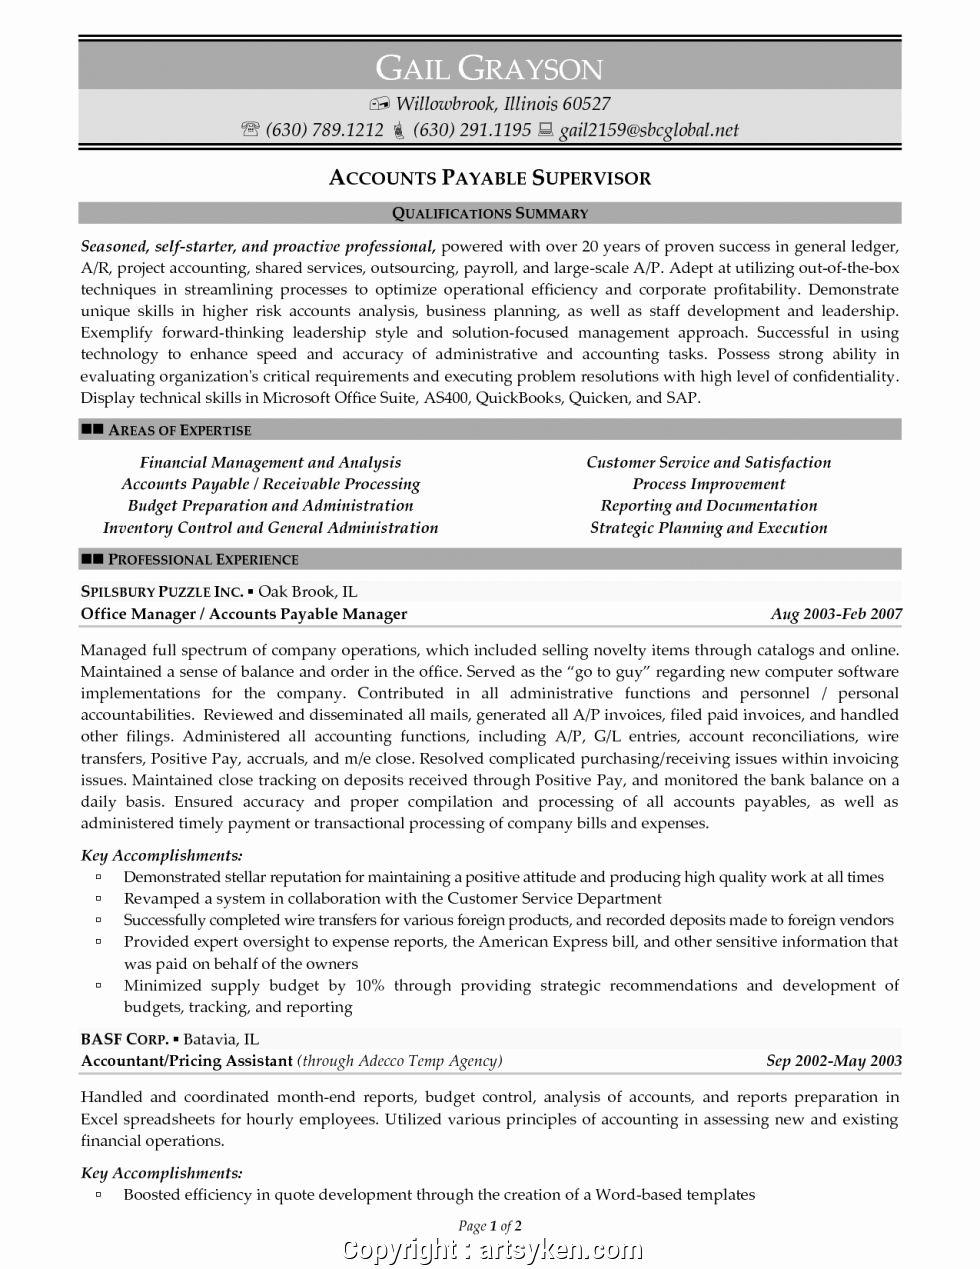 23 accounts payable job description resume in 2020